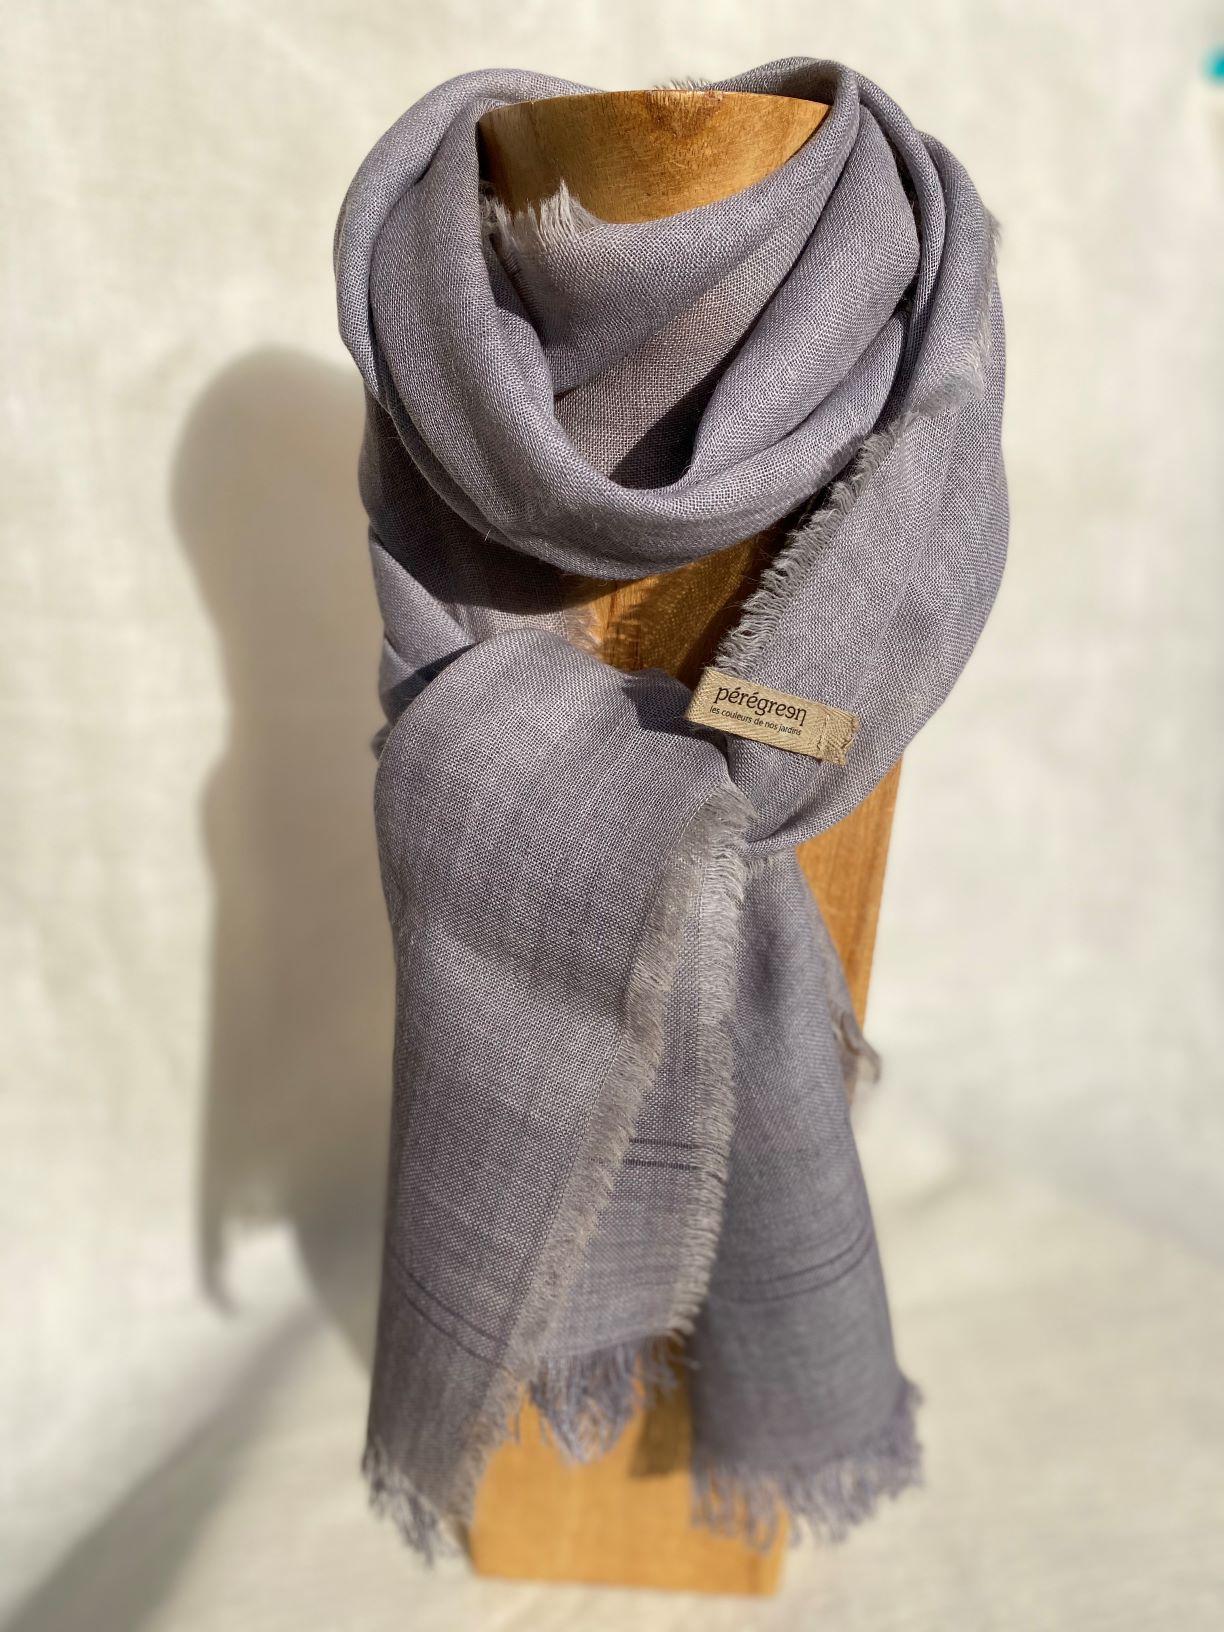 Petit foulard bleu clair lin alpaga - couleur et teinture naturelle